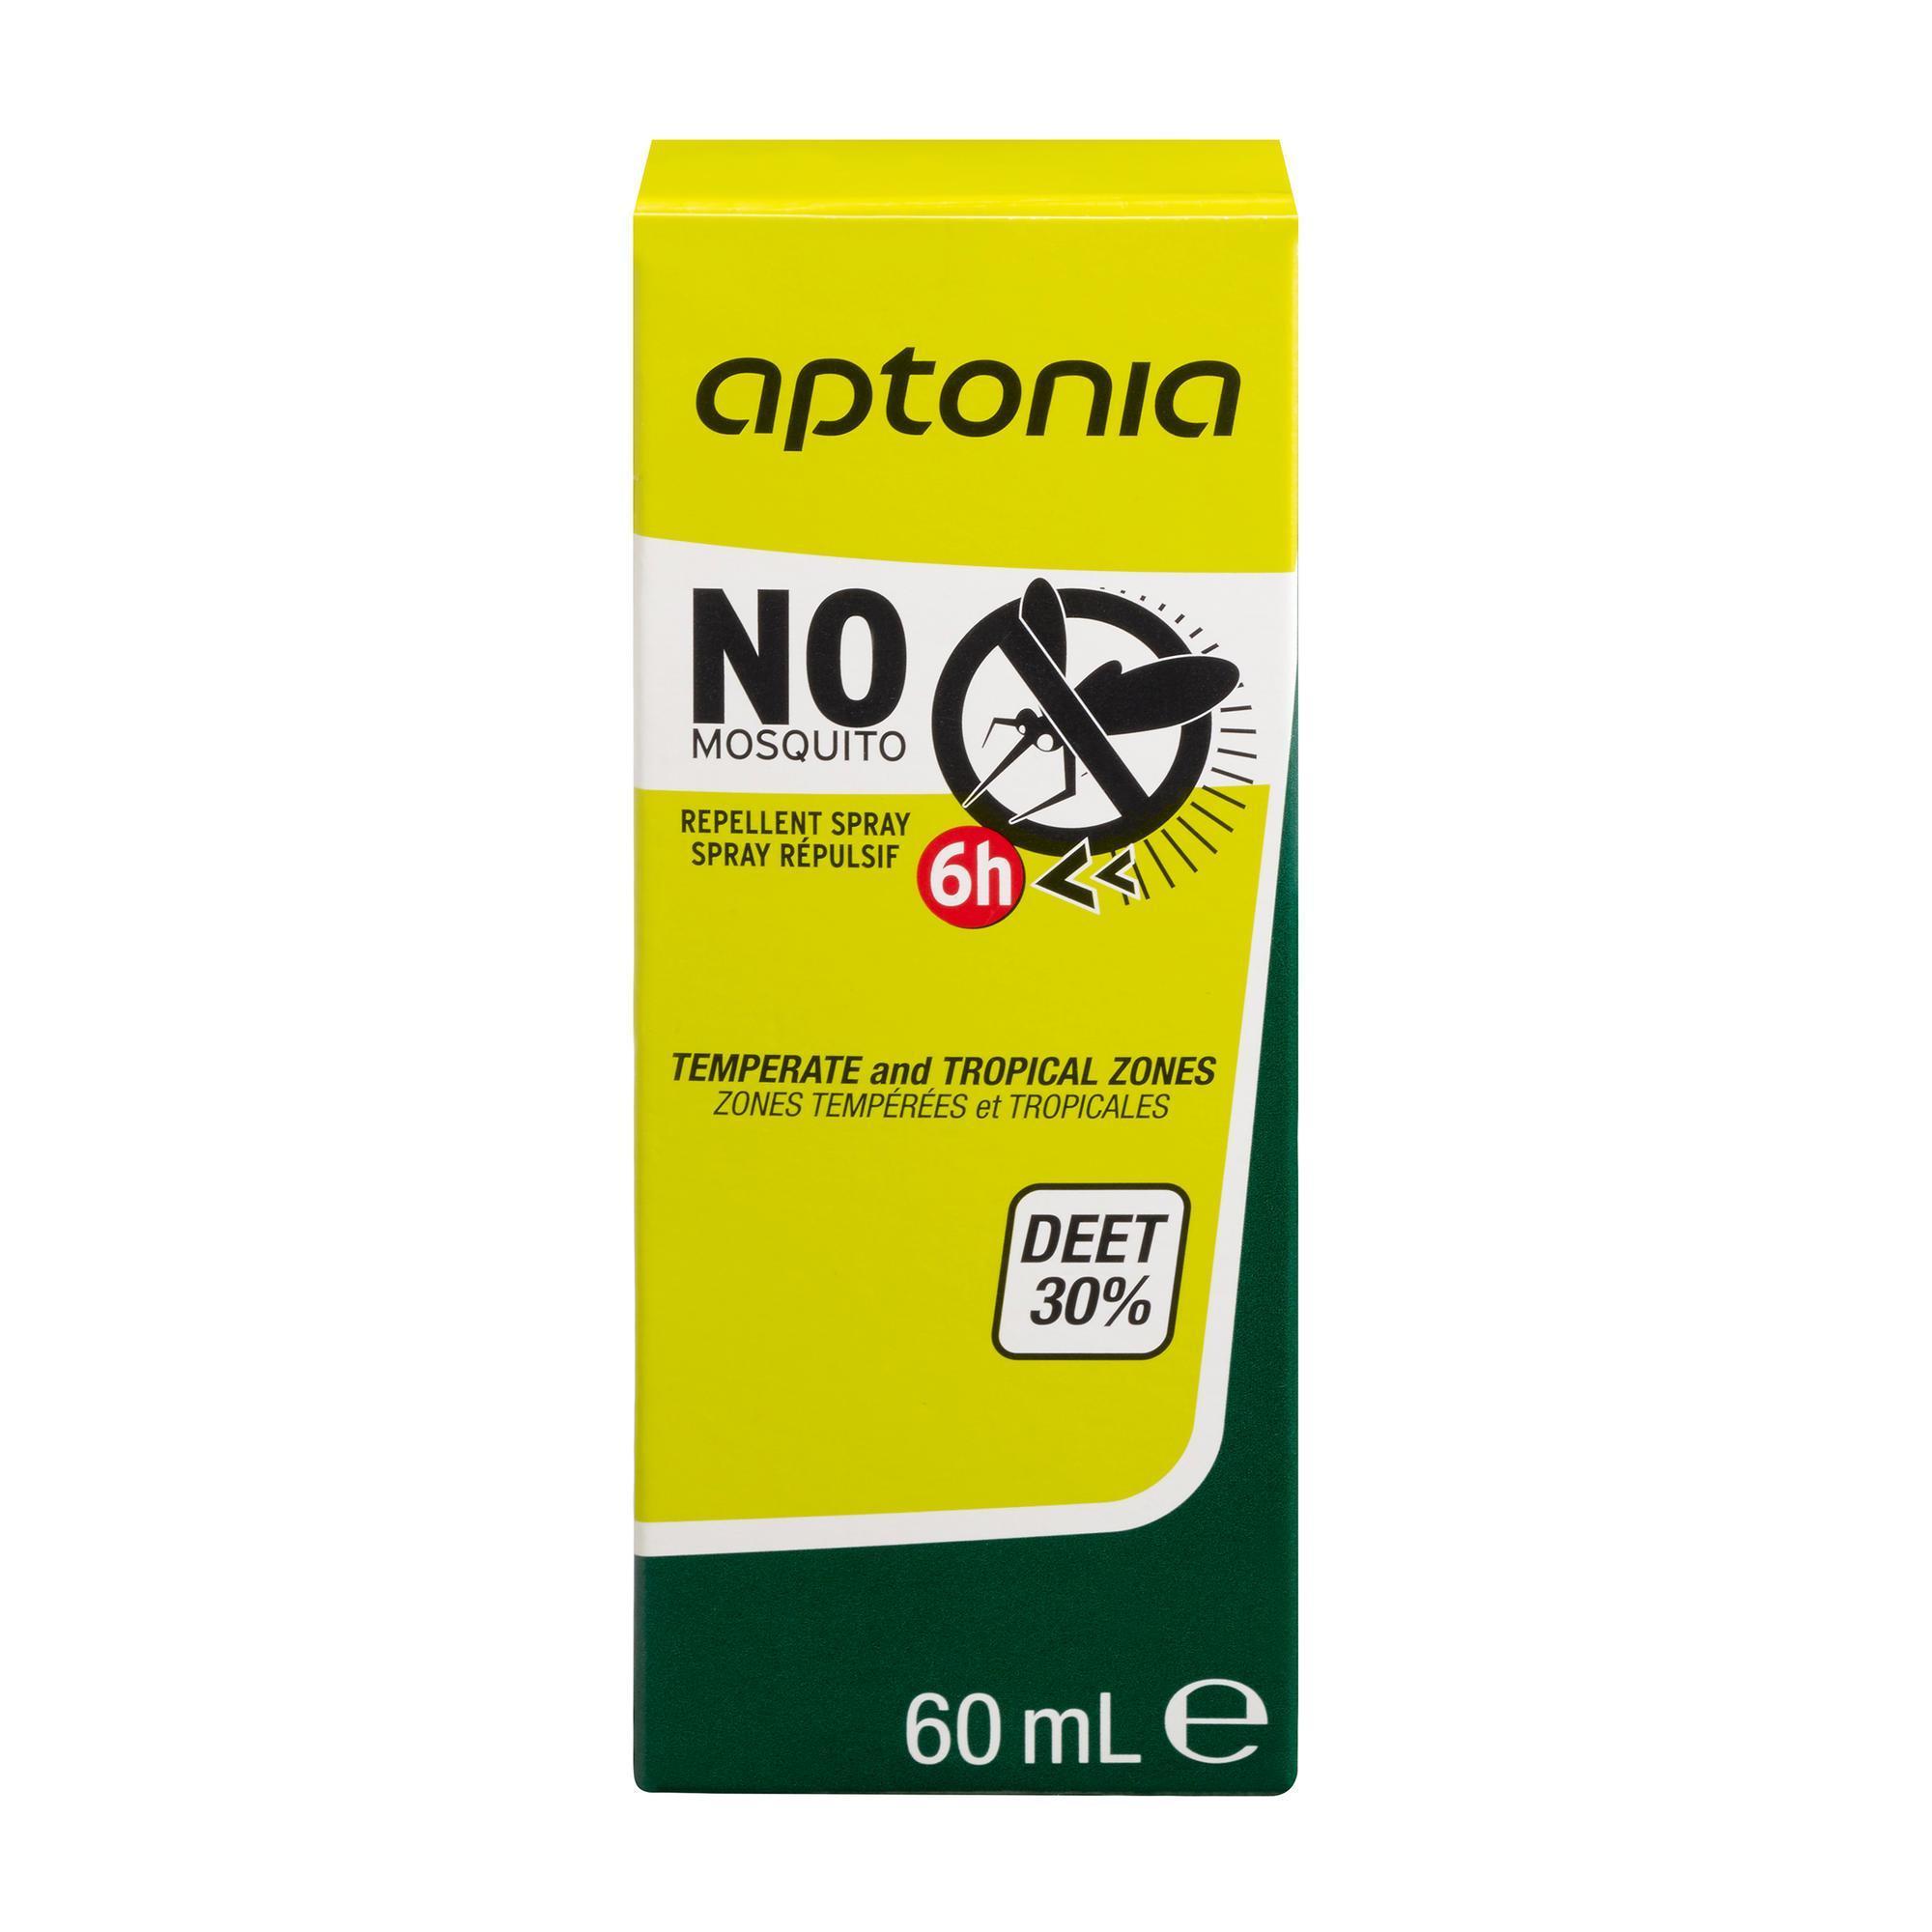 Forclaz Insectenwerende spray Aptonia Deet 30% 60 ml